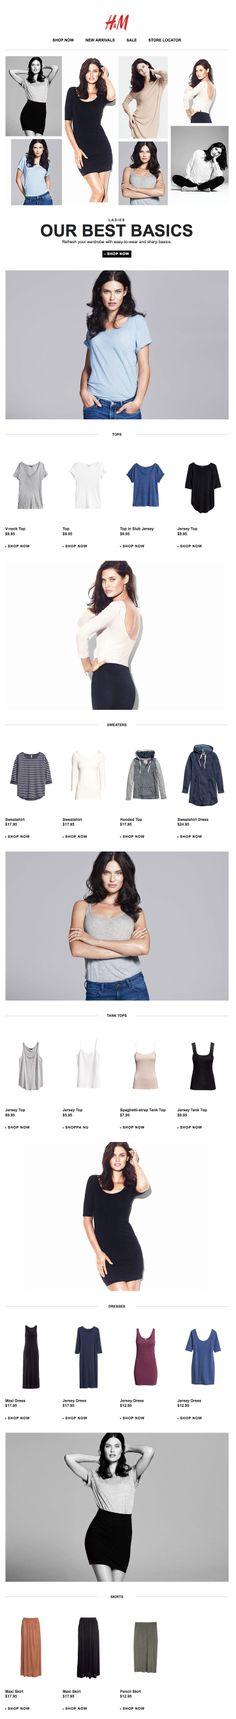 H&M newsletter, email design